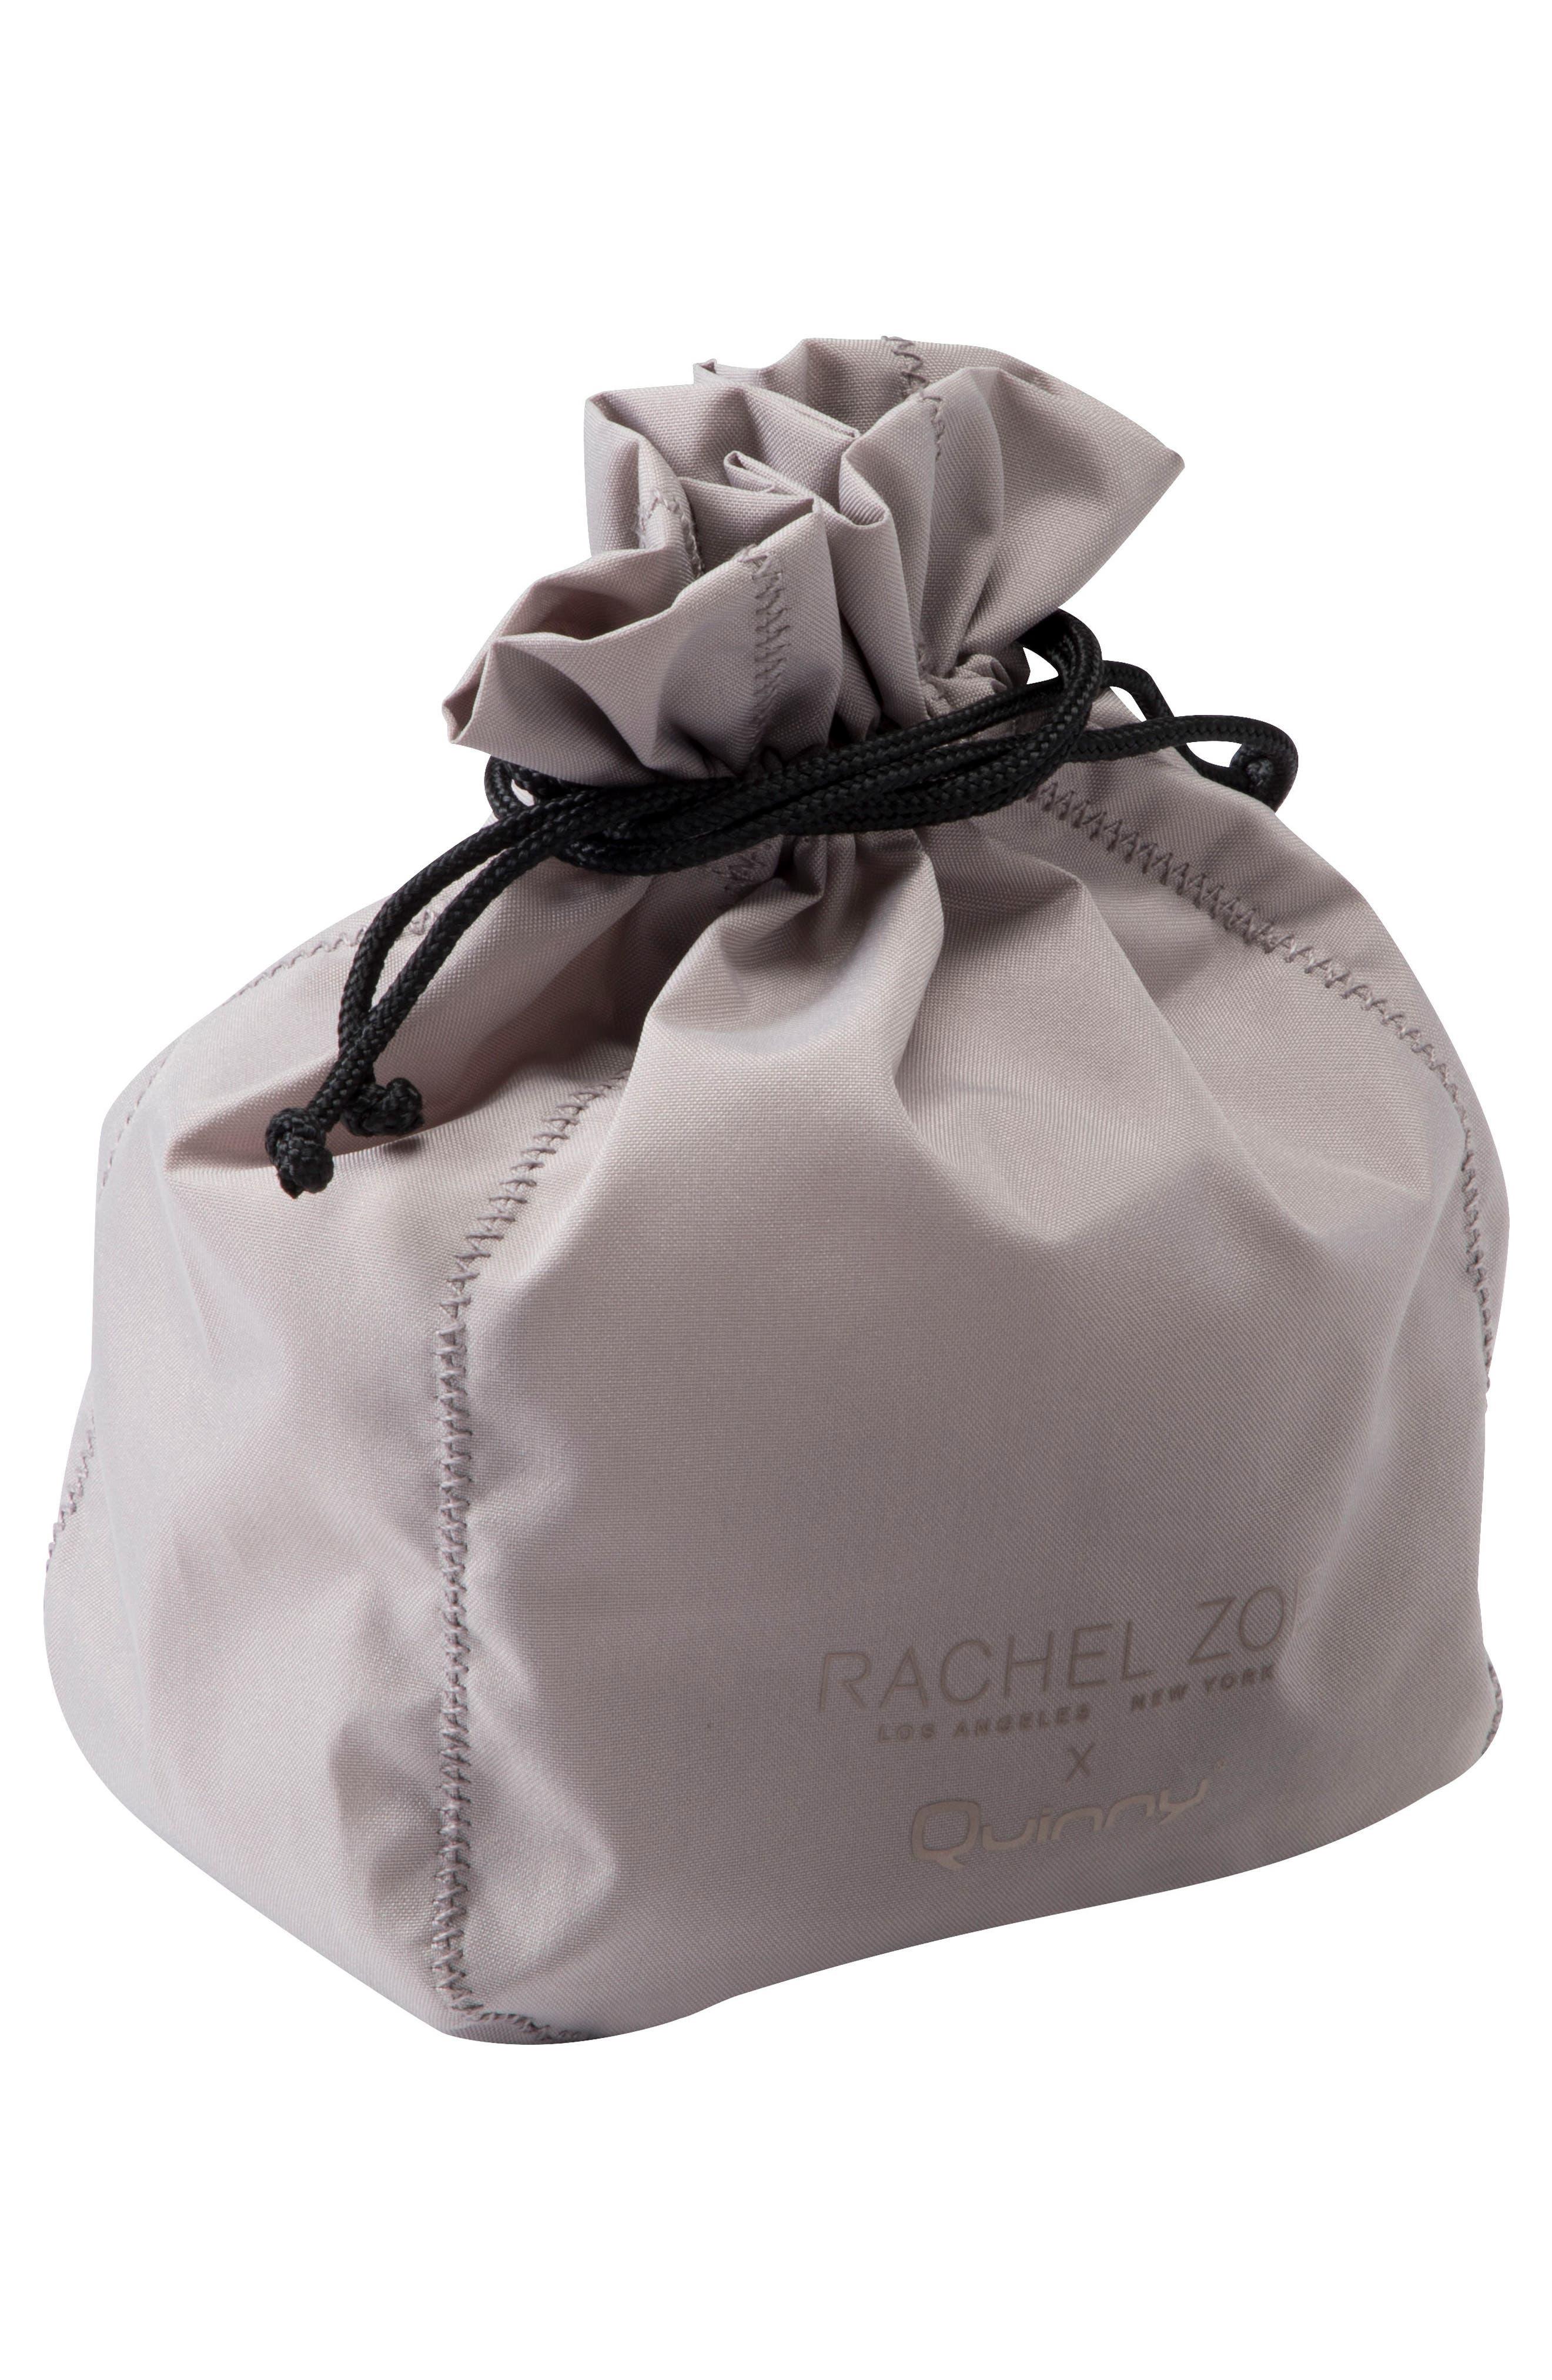 x Rachel Zoe Luxe Sport Diaper Bag,                             Alternate thumbnail 16, color,                             Rz Luxe Sport